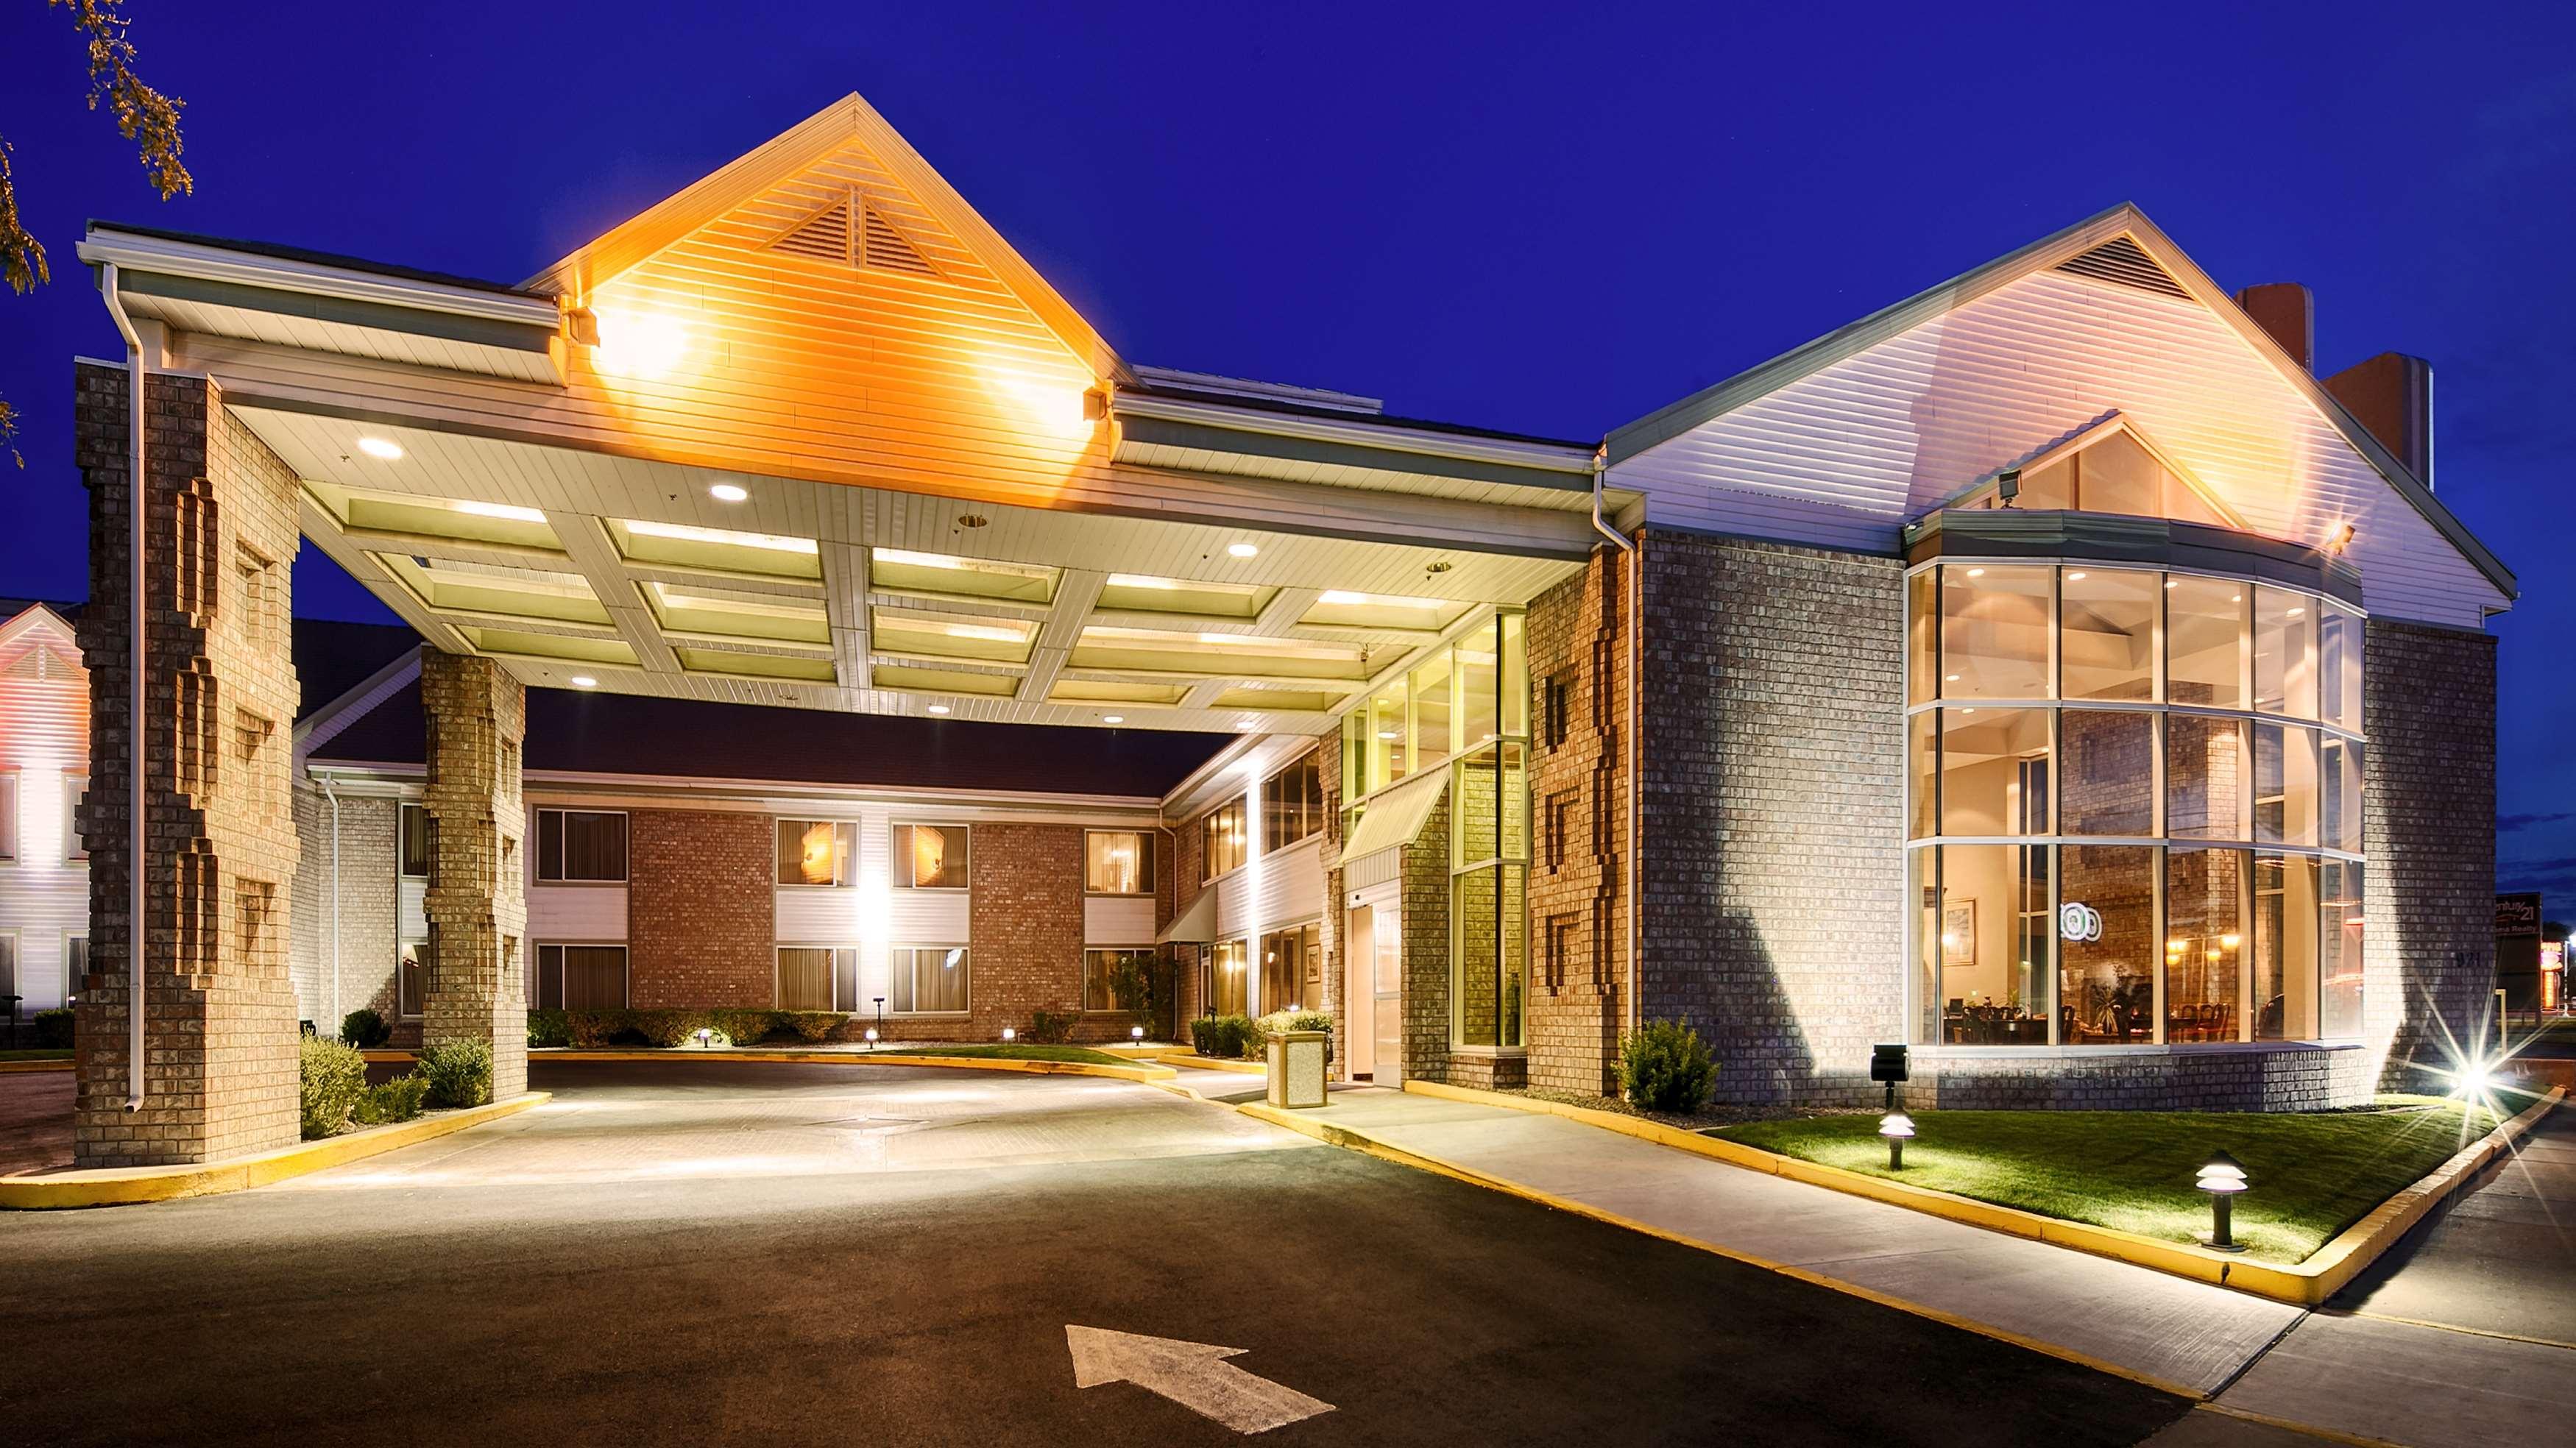 Best Western Plus Gold Country Inn